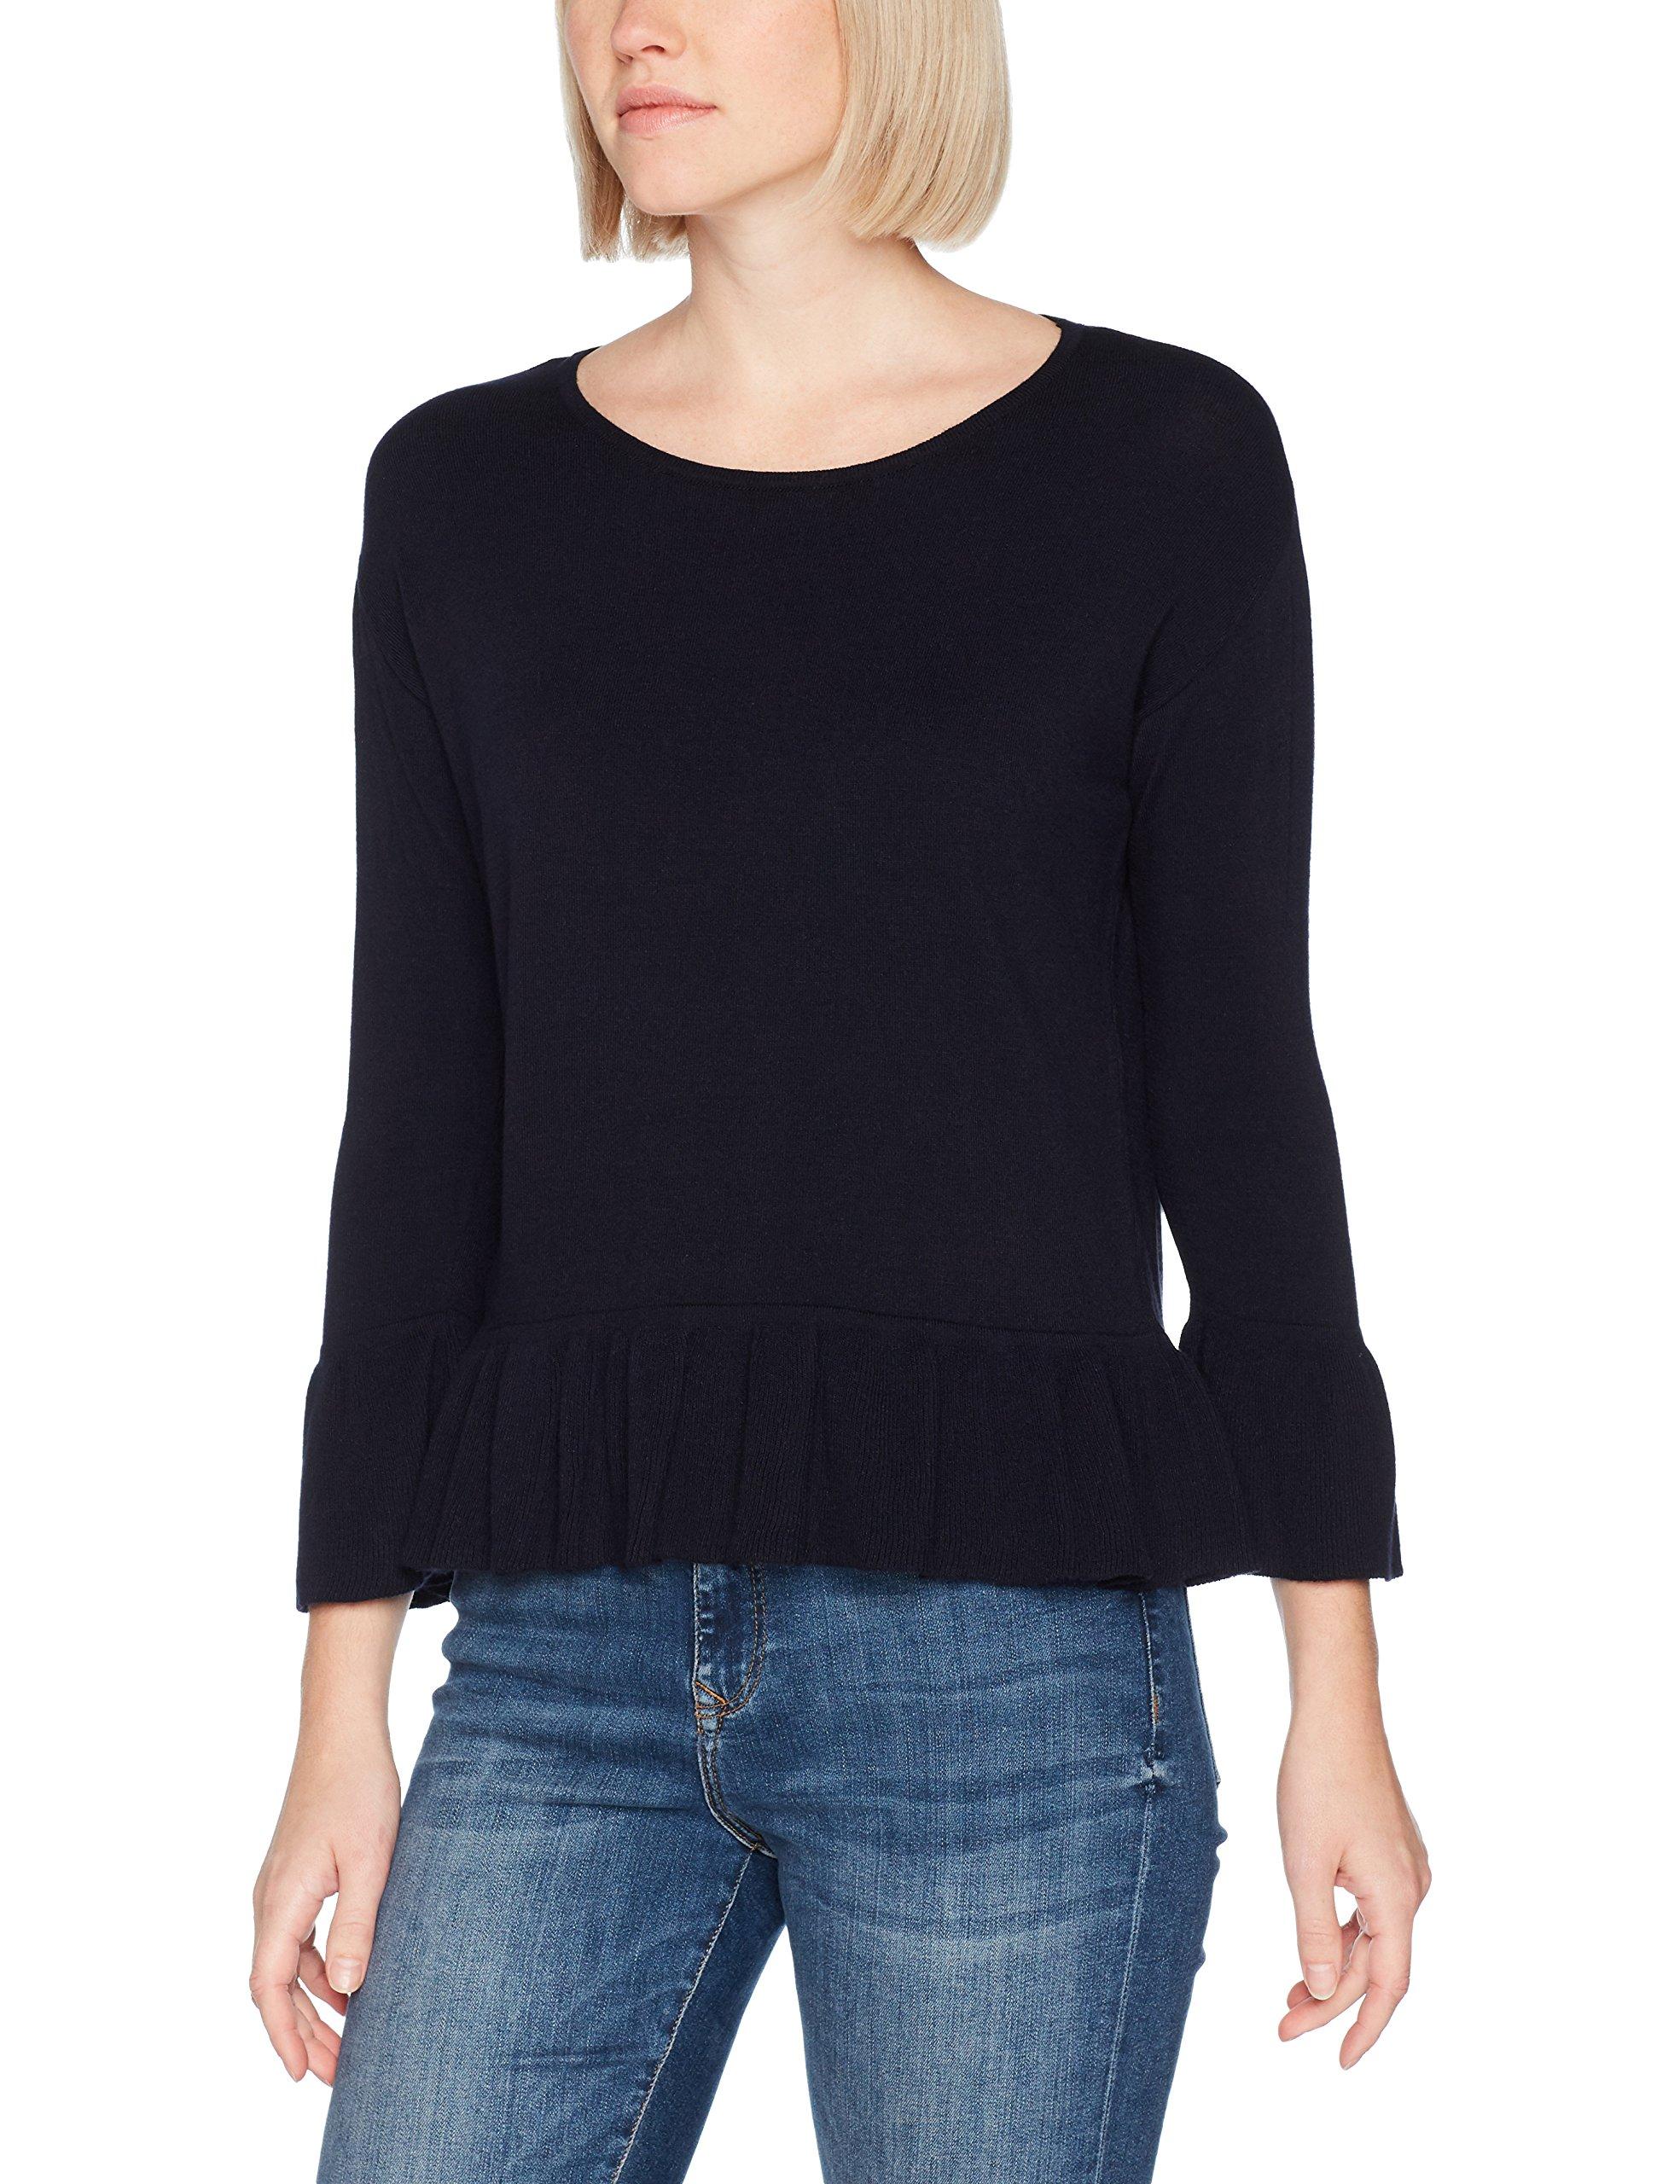 Moreamp; Moreamp; Femme PullBleumarine Pullover 037540 037540 Moreamp; PullBleumarine Pullover Femme Pullover l1KJFc